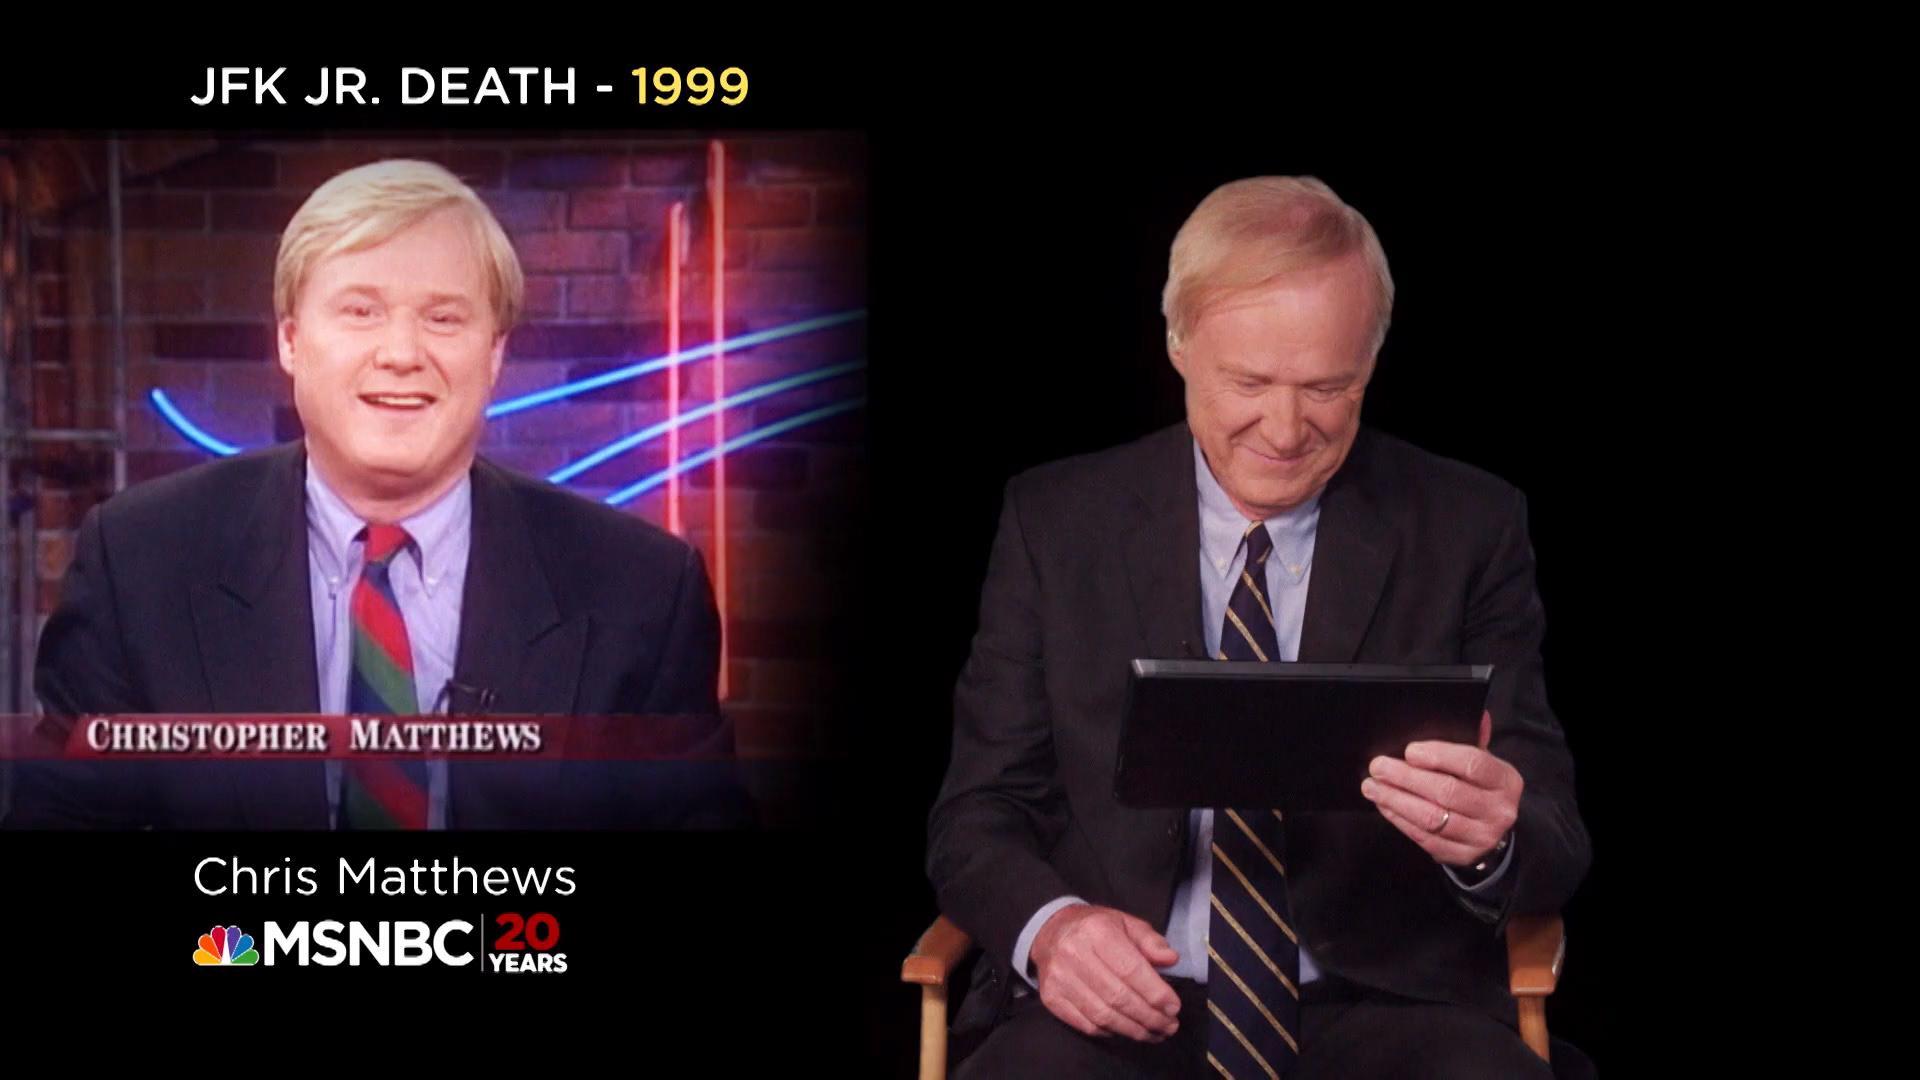 Chris Matthews on John F. Kennedy Jr.